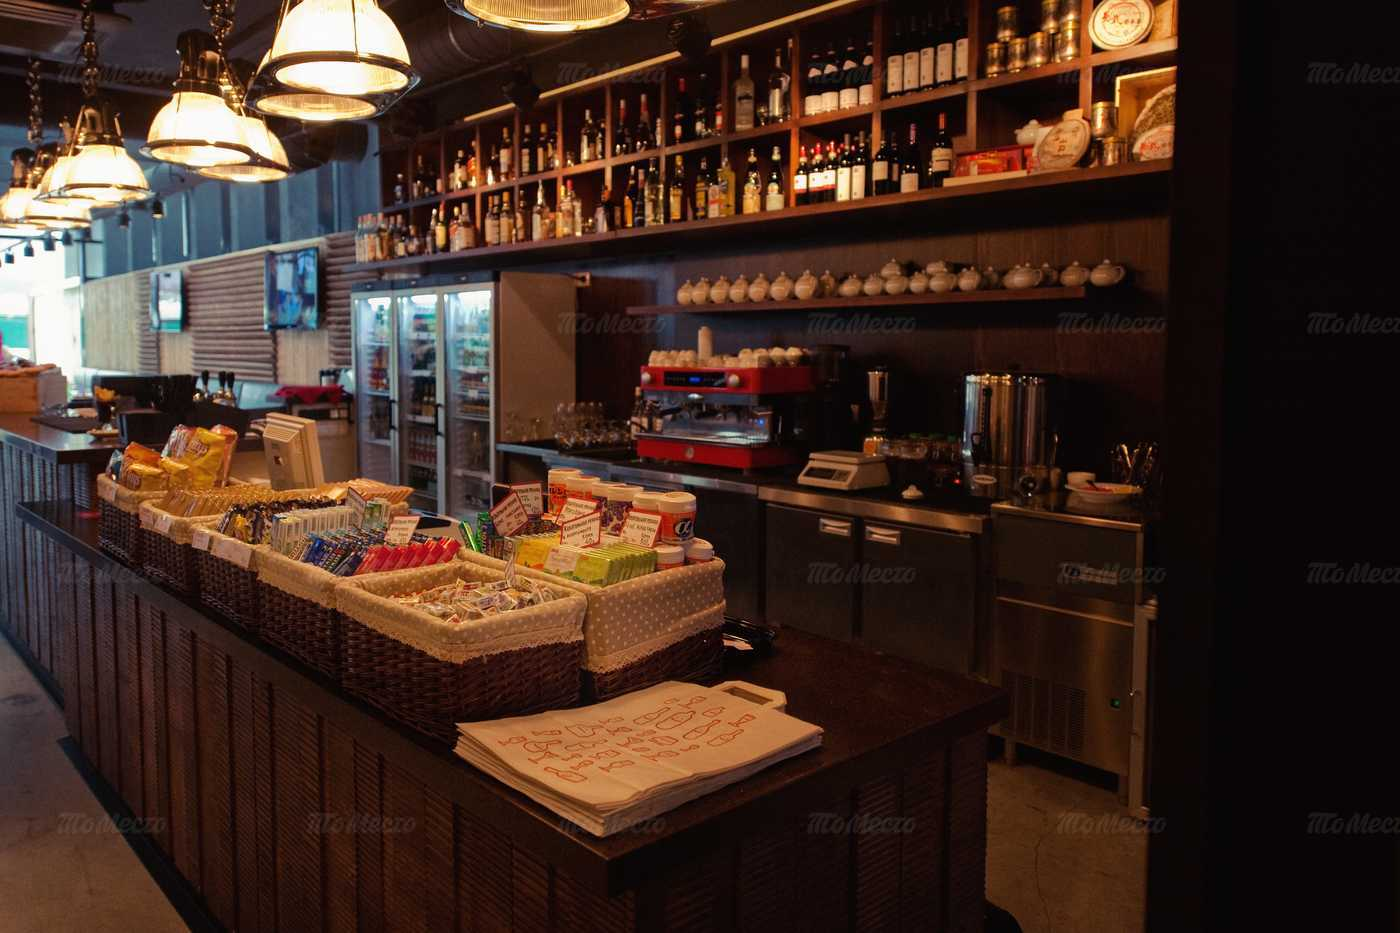 Меню ресторана Бульон Крутон на улице Крылатские Холмы